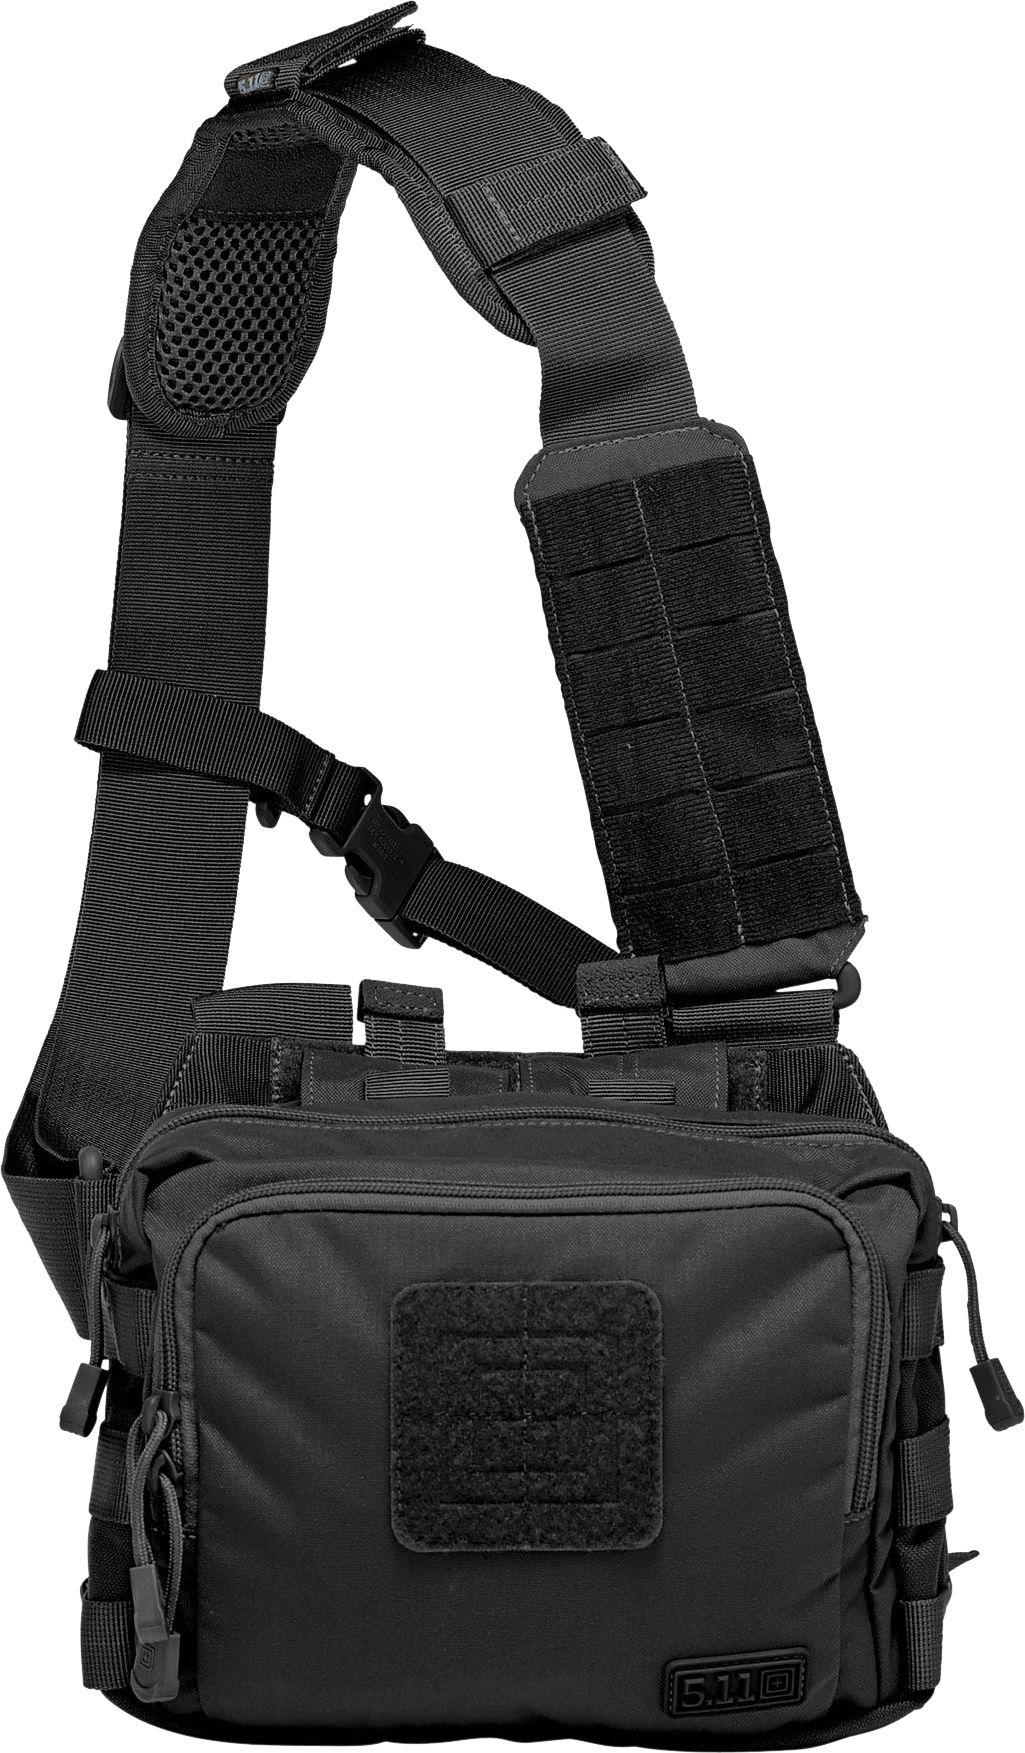 5.11 Tactical 2 Banger Gear Bag, No Size, Black thumbnail